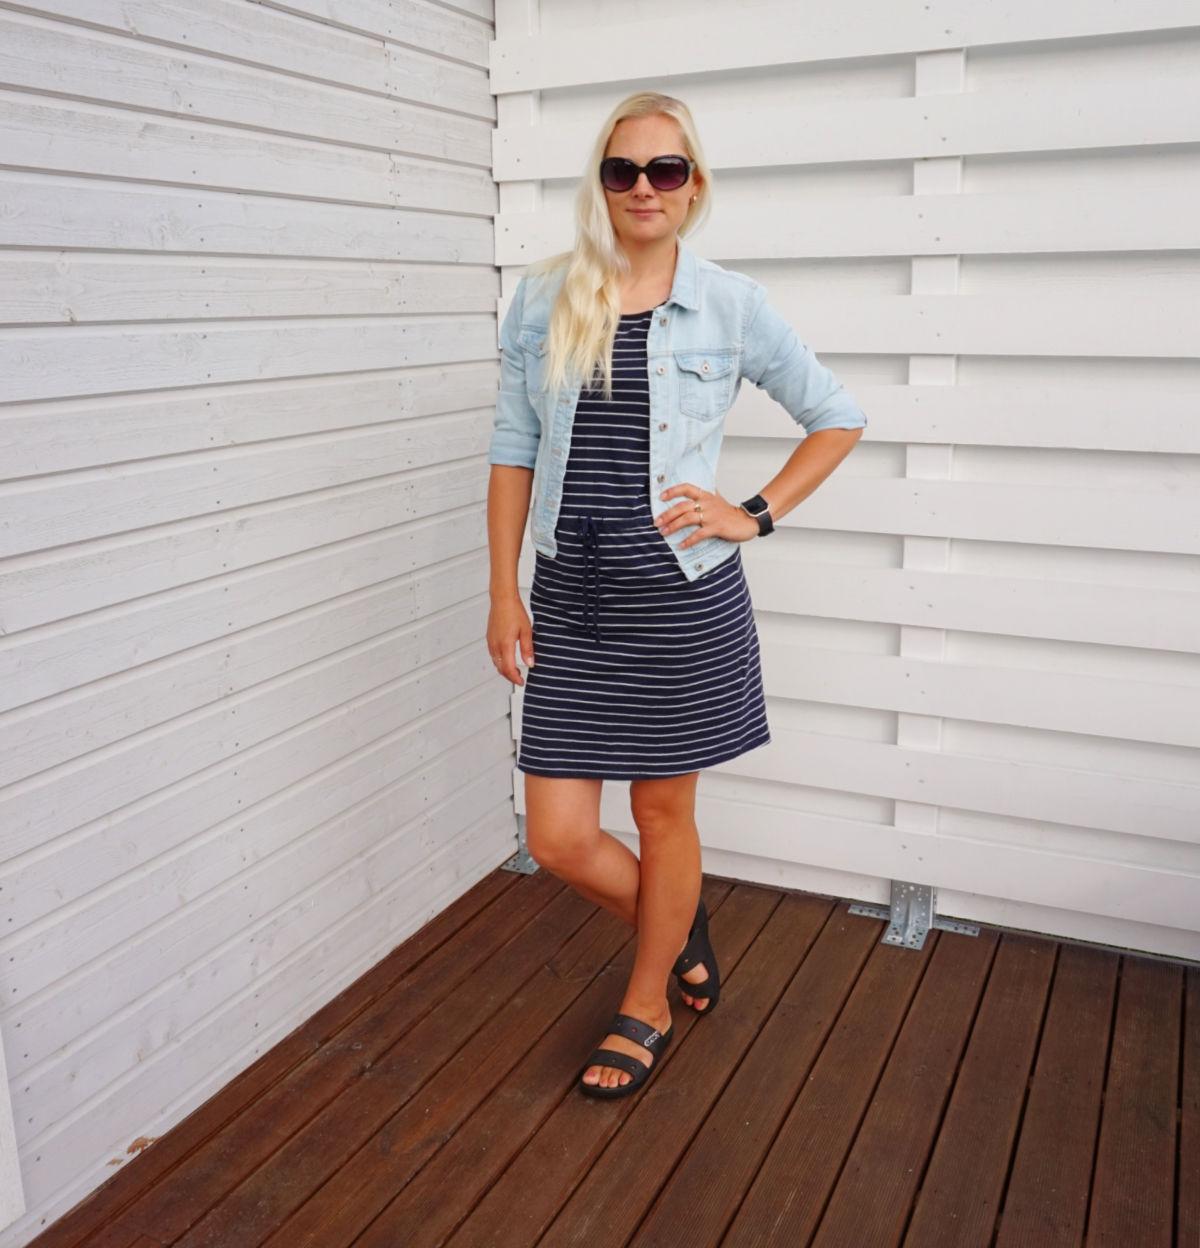 ONLY striped mini dress, ONLY denim jacket, Classic Crocs sandals